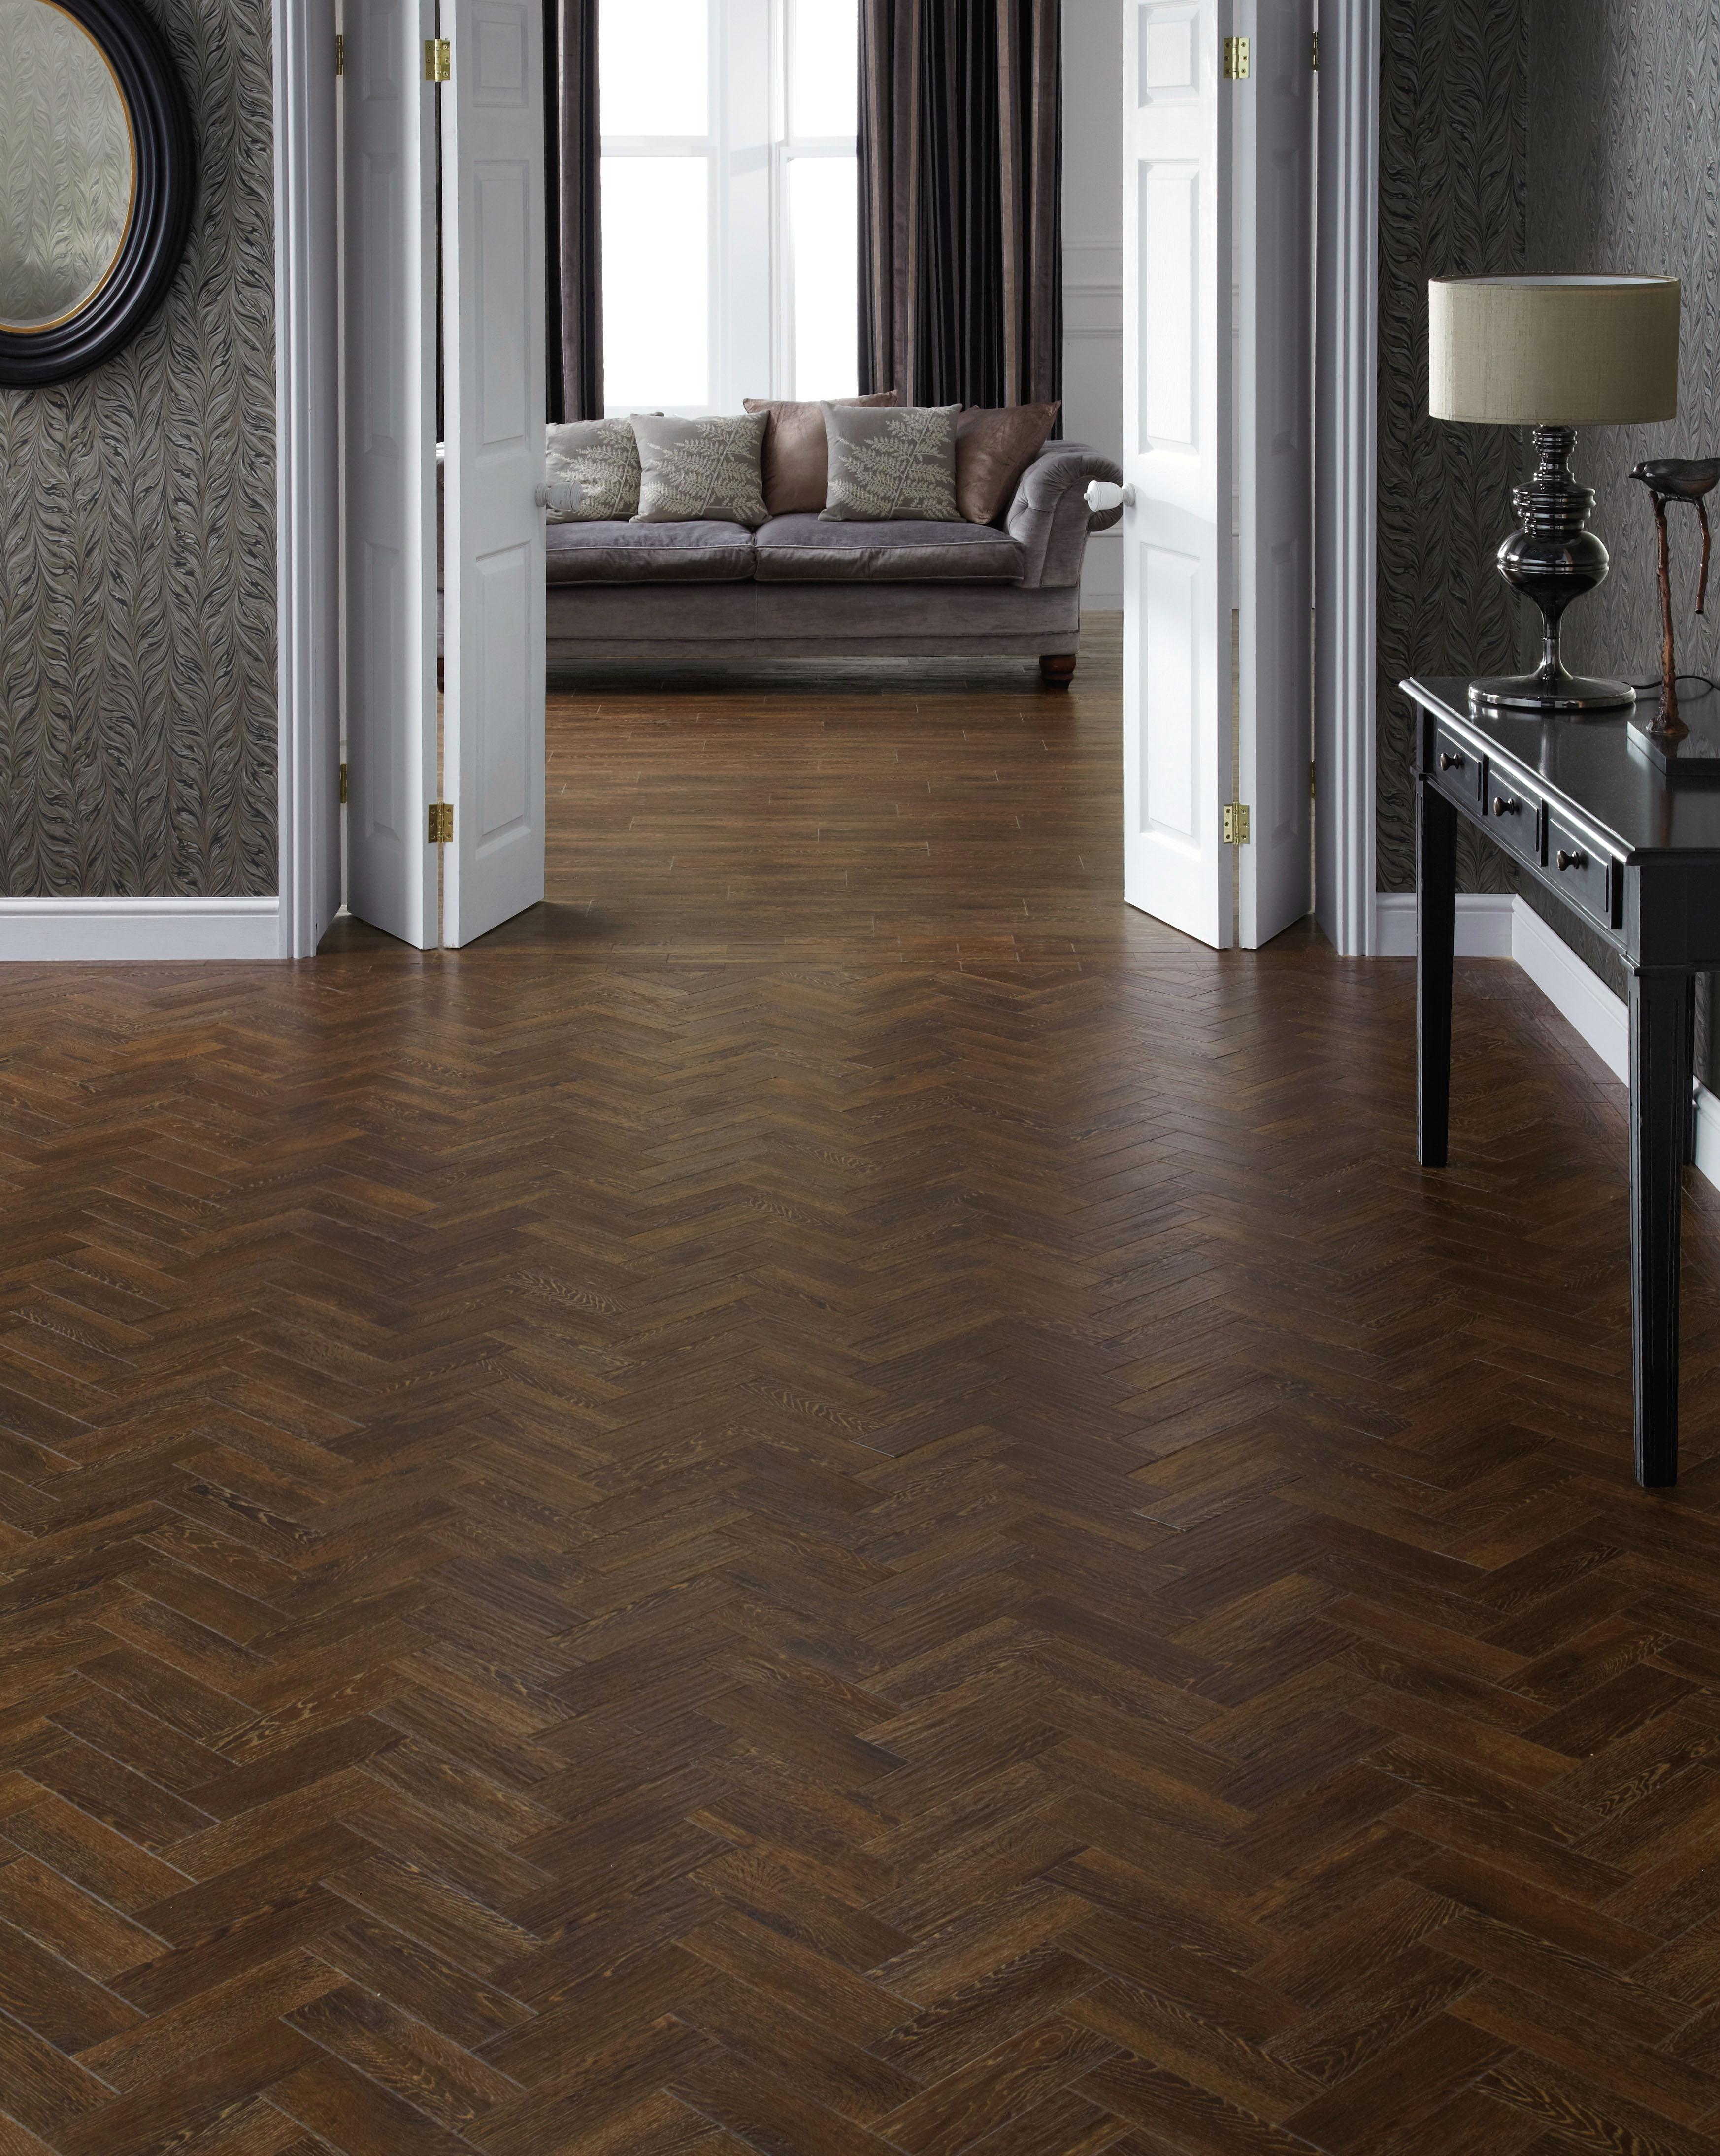 barn floor flooring tough the hallway floors karndean carpet in bristol